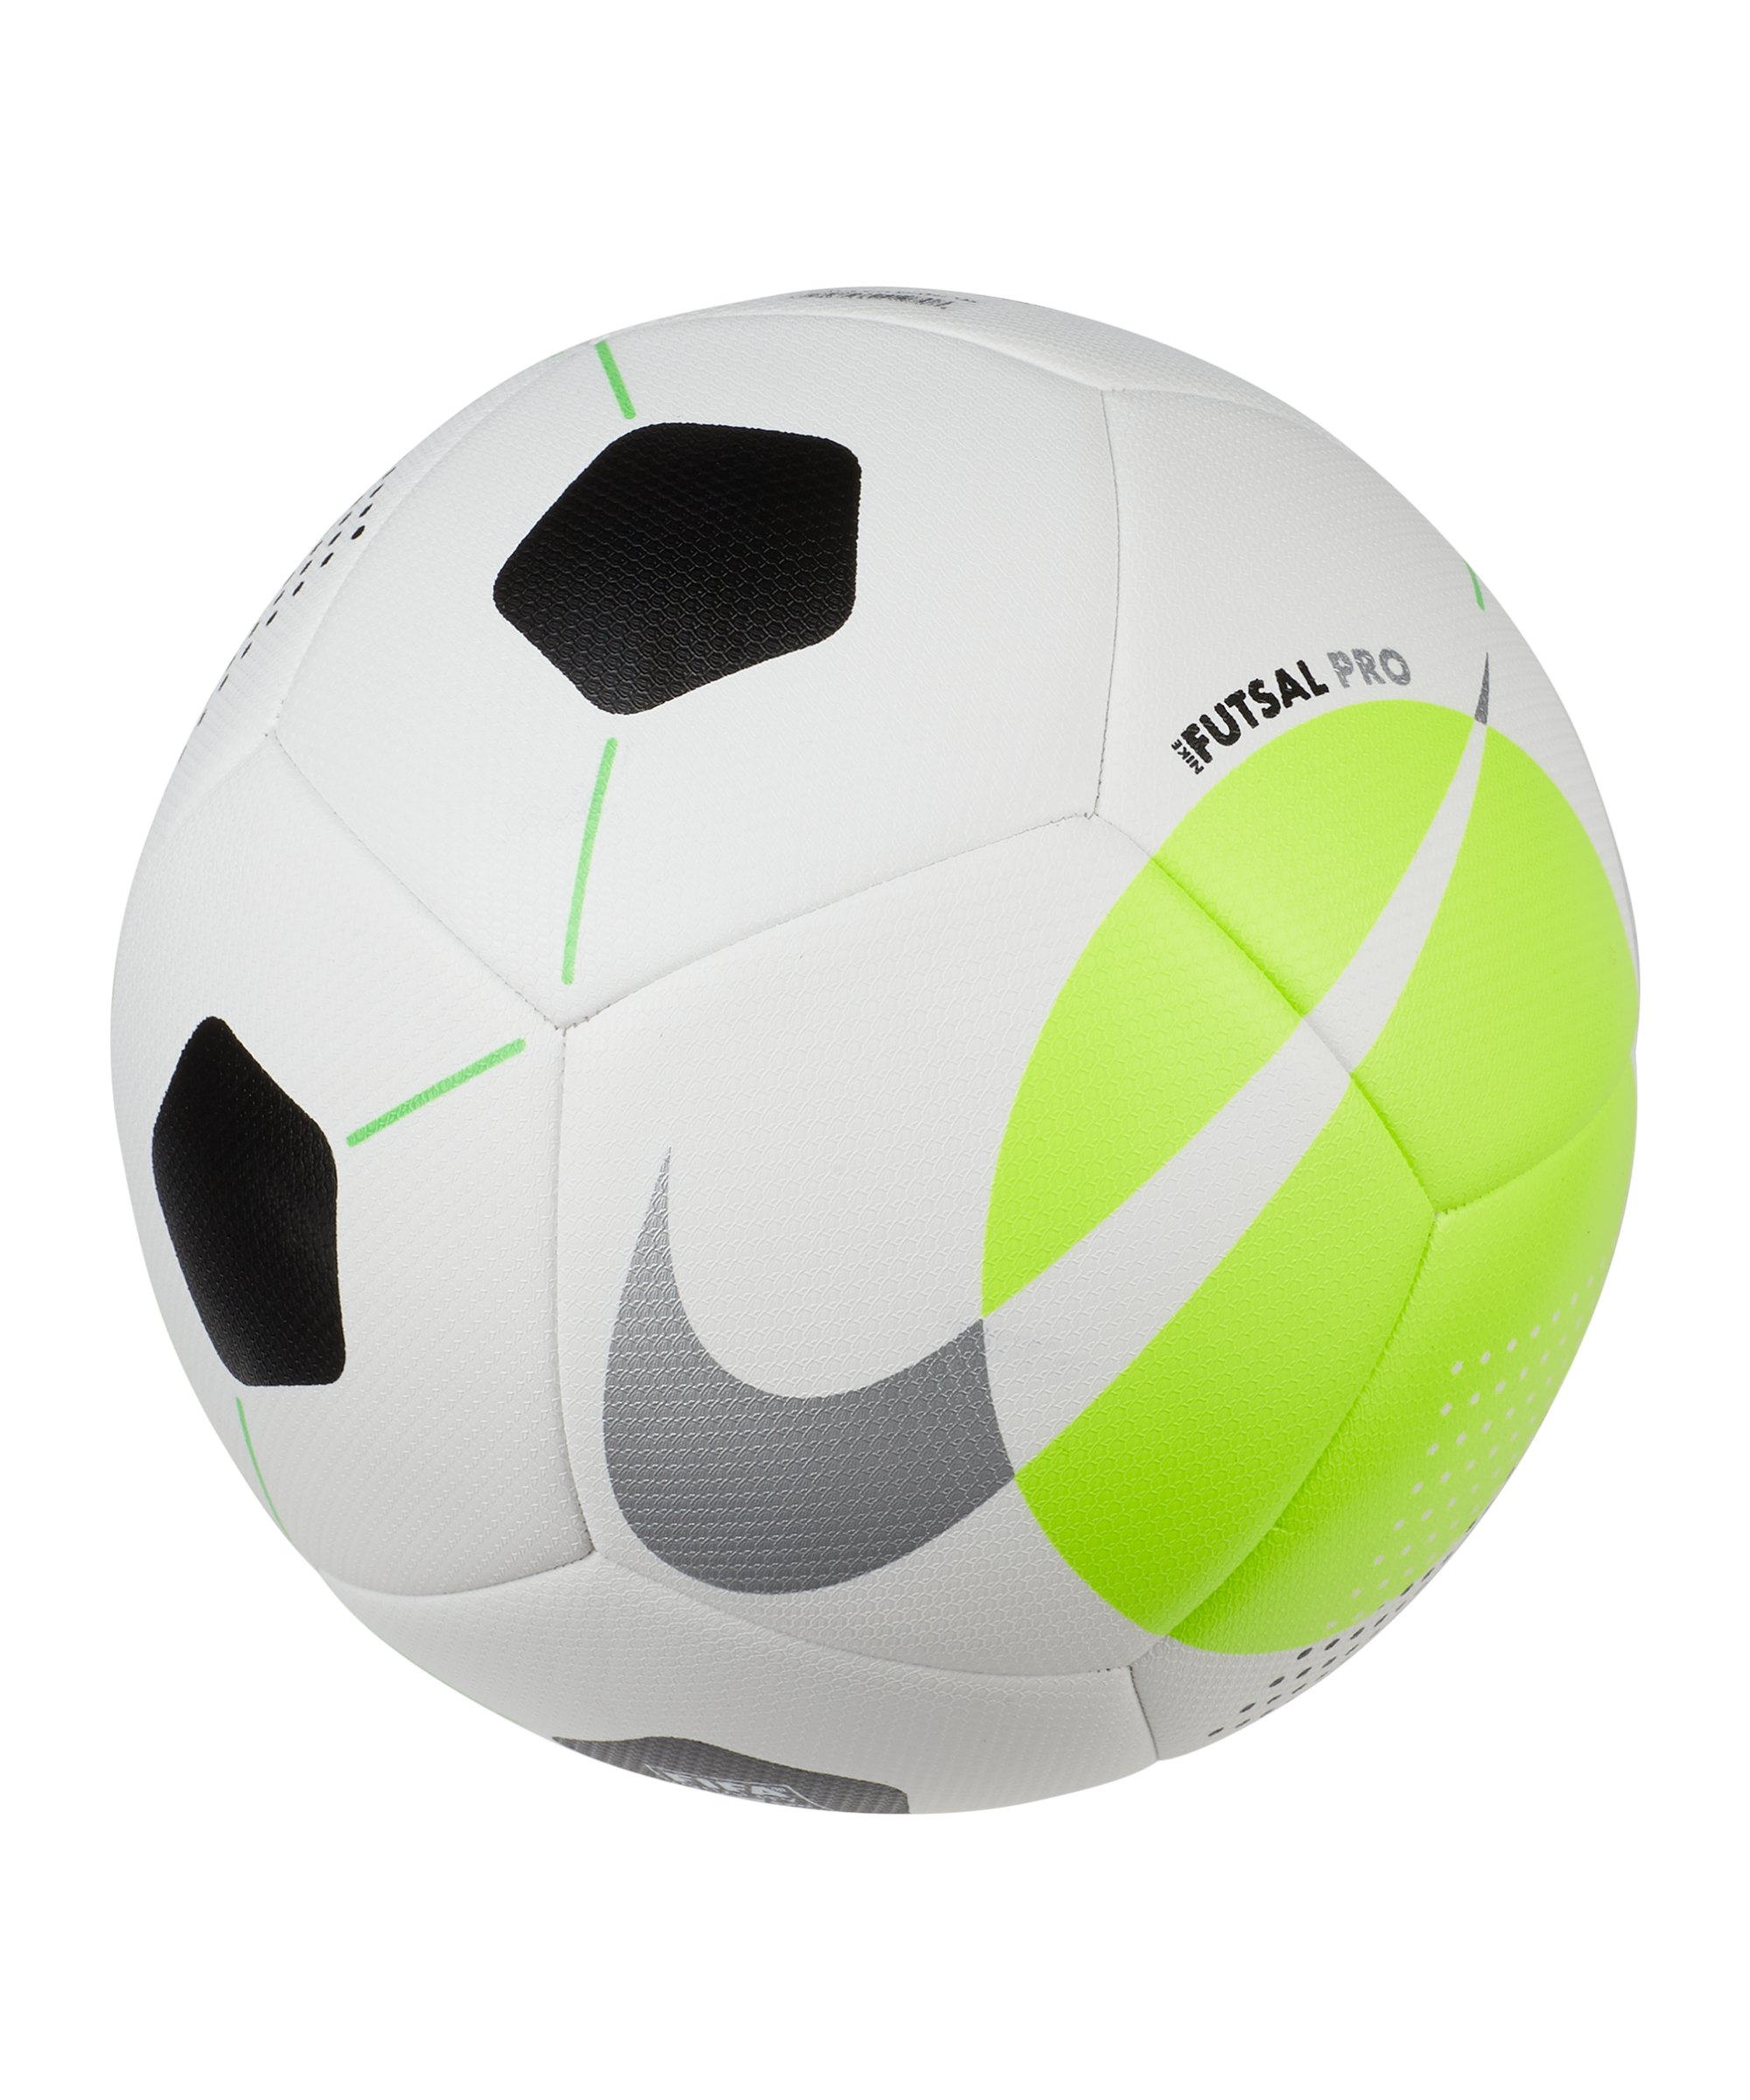 Nike Futsal Pro Team Weiss Grün F100 - weiss